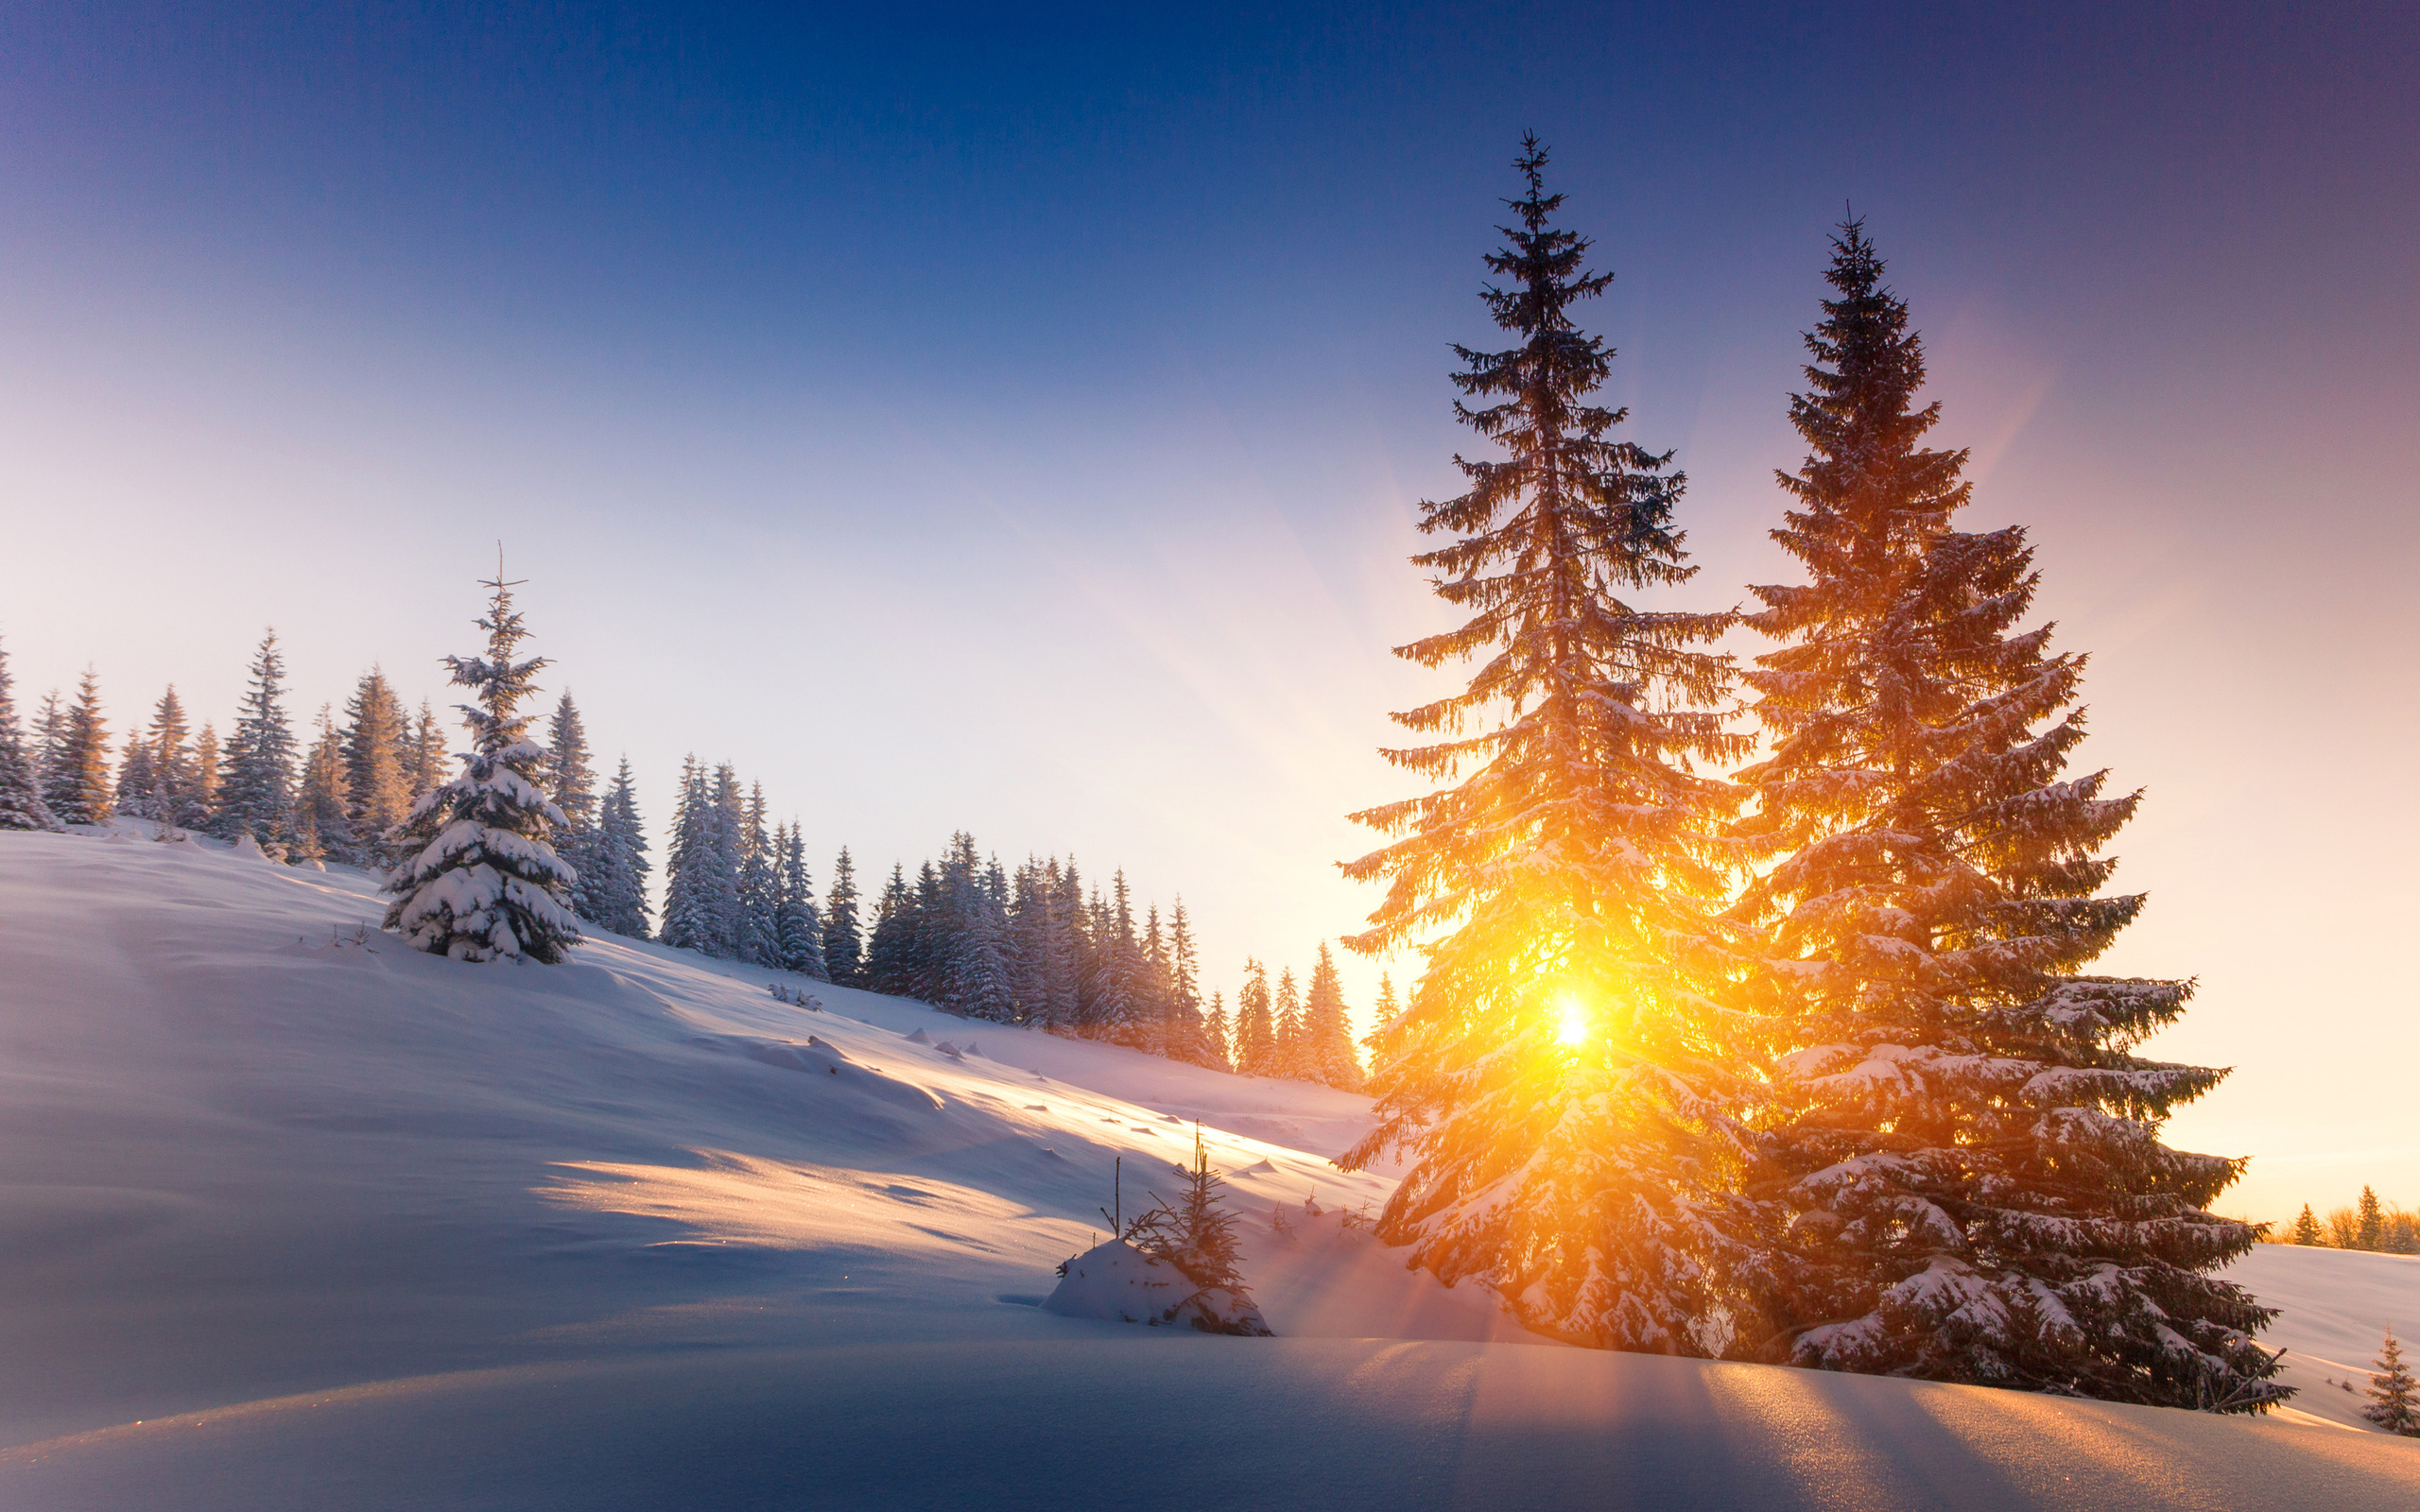 природа, пейзаж, зима, снег, склон, деревья, ели, солнце, лучи, тени